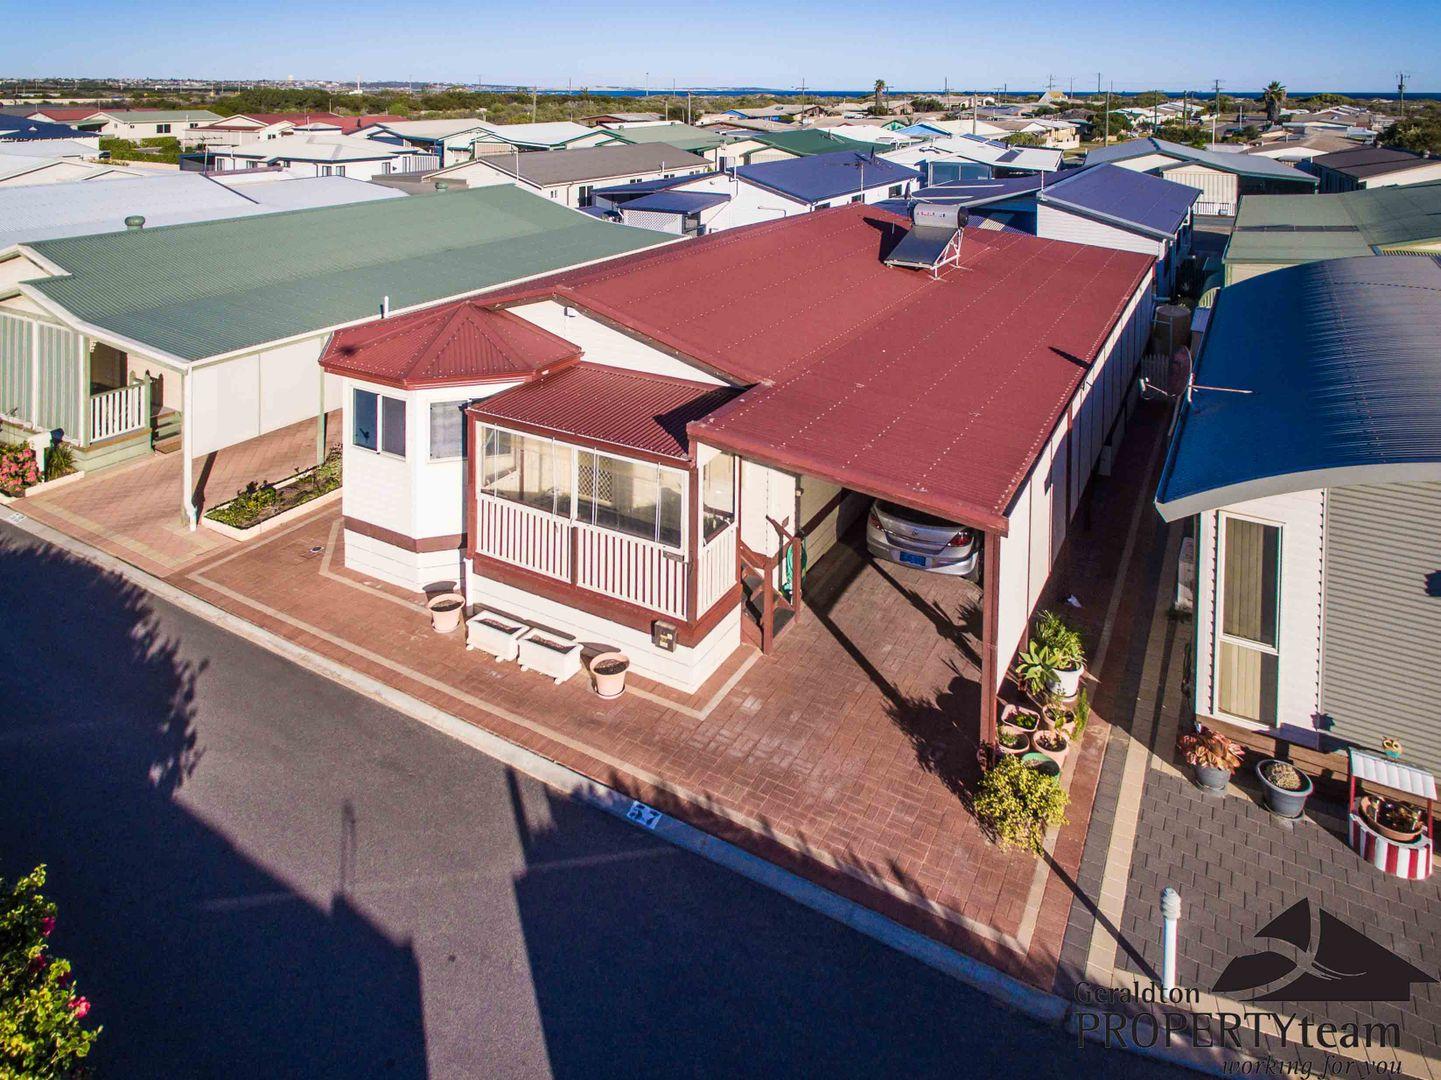 57/463 Marine Terrace, Geraldton WA 6530, Image 0